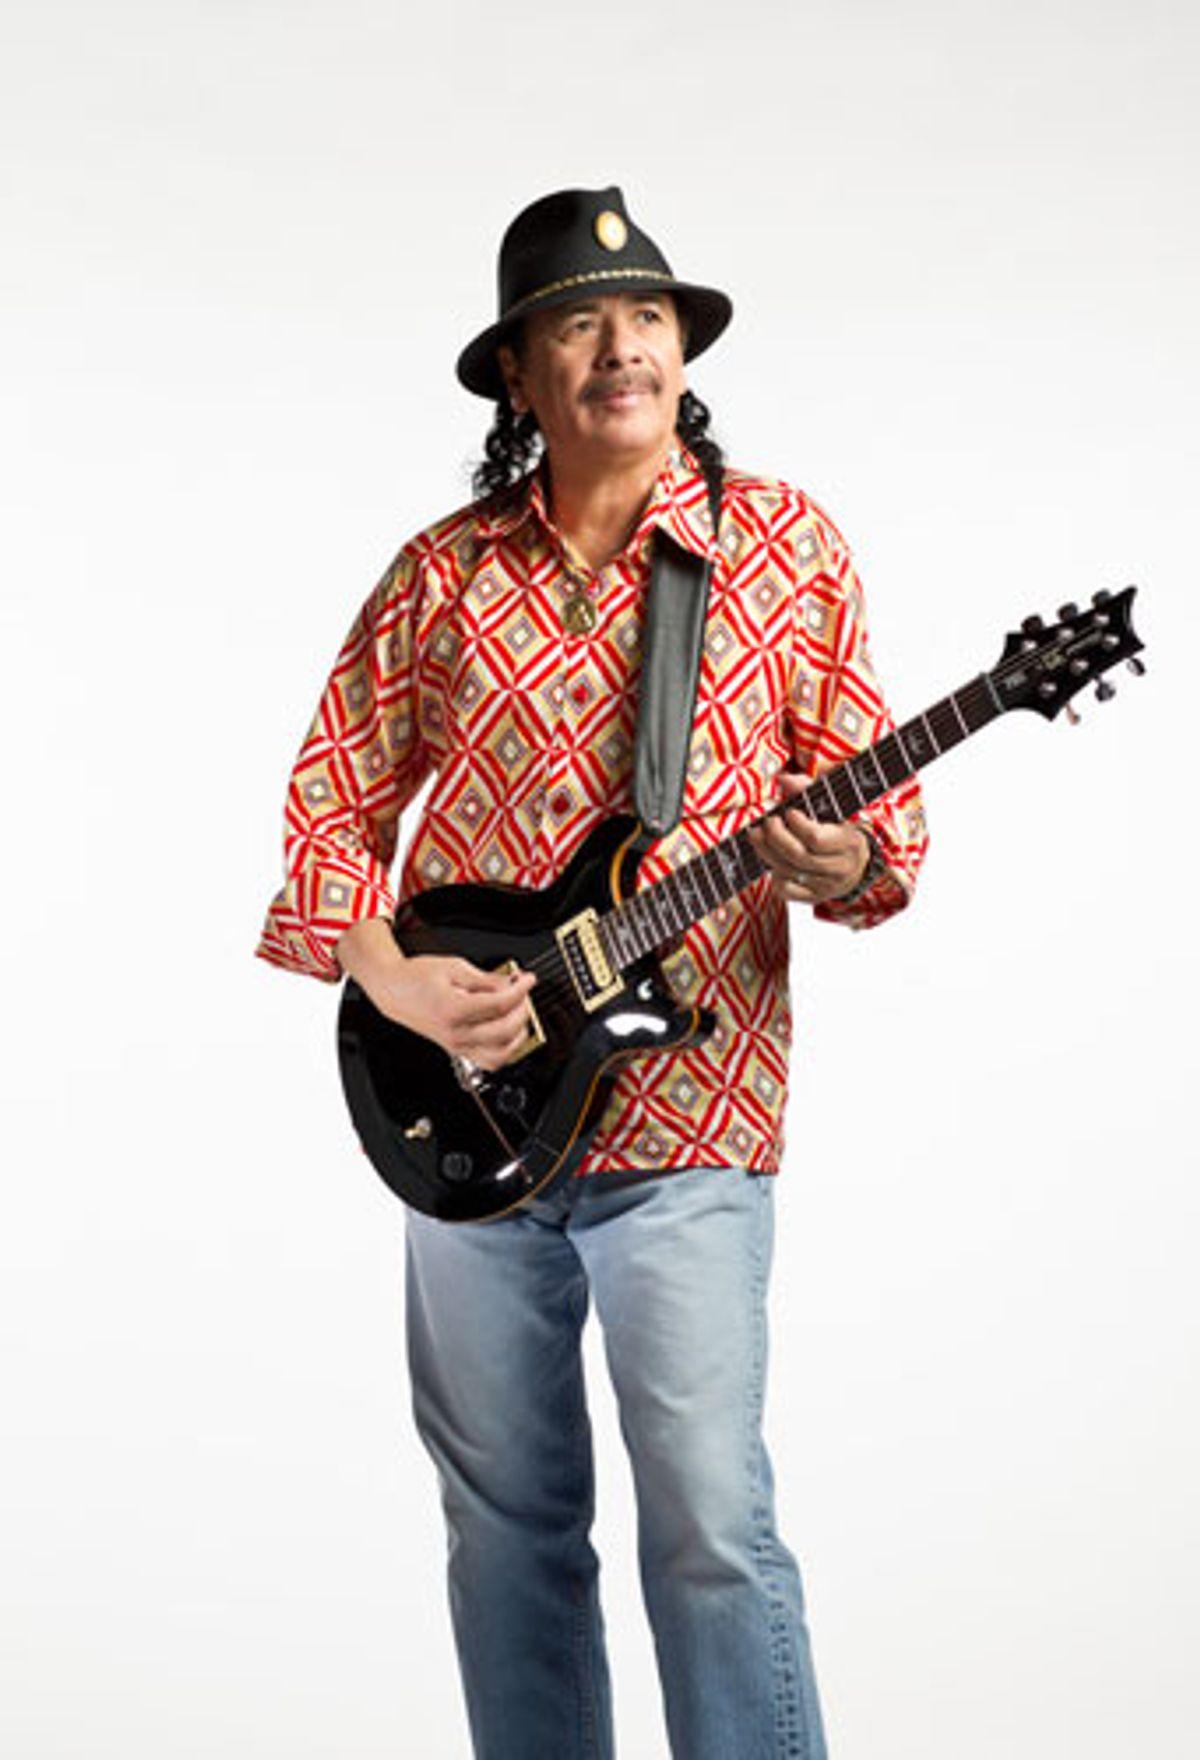 Carlos Santana to Receive Kennedy Center Honors